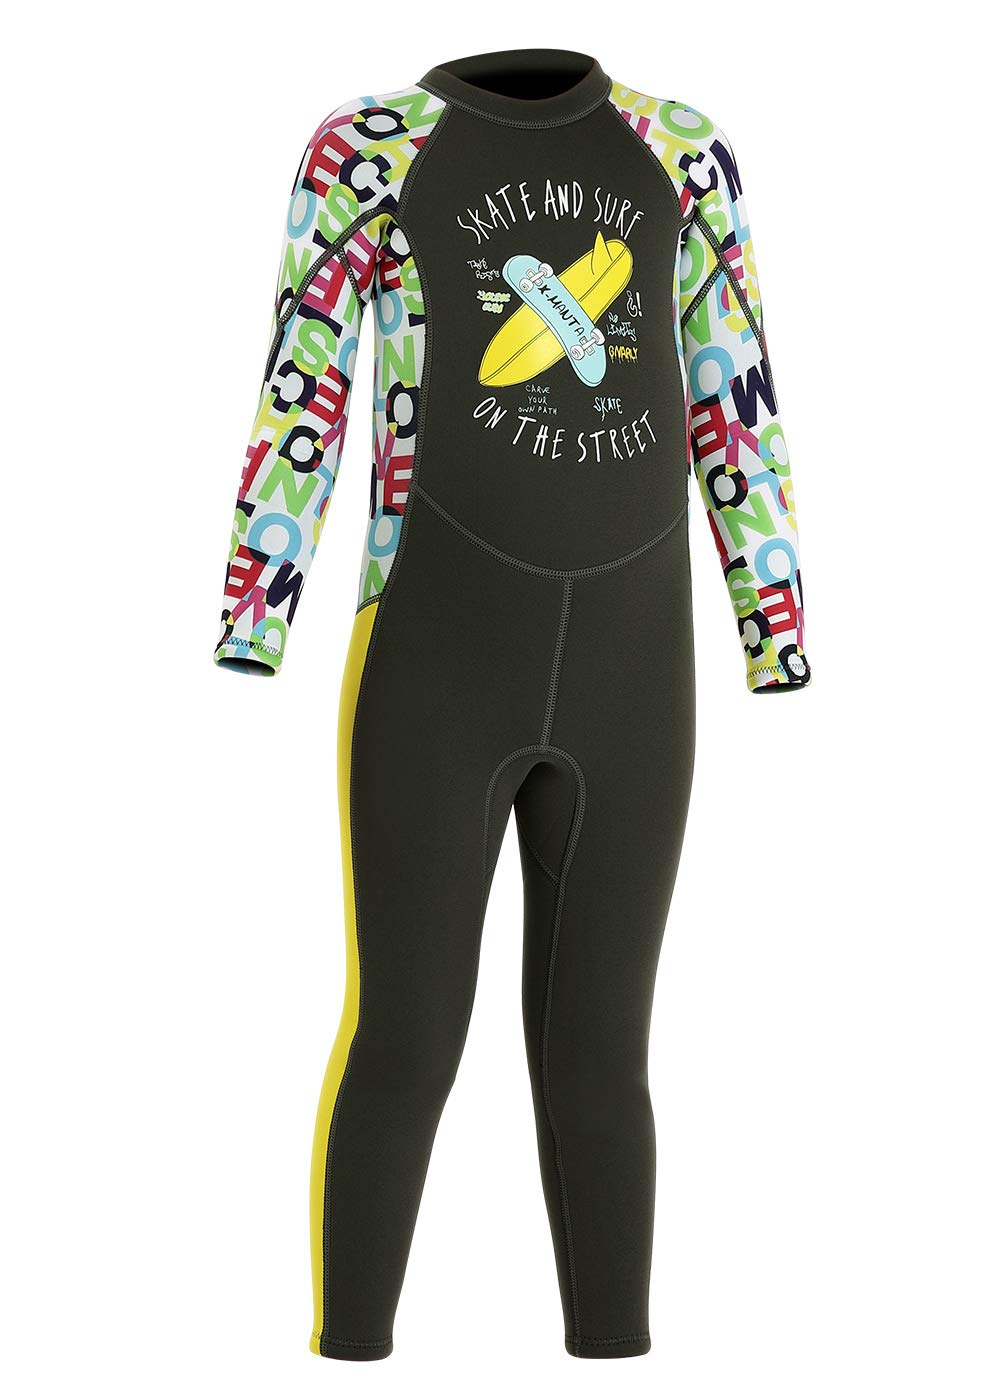 Happy Cherry Kids Wetsuit 2.5mm Neoprene Full Body Thermal Swimsuit